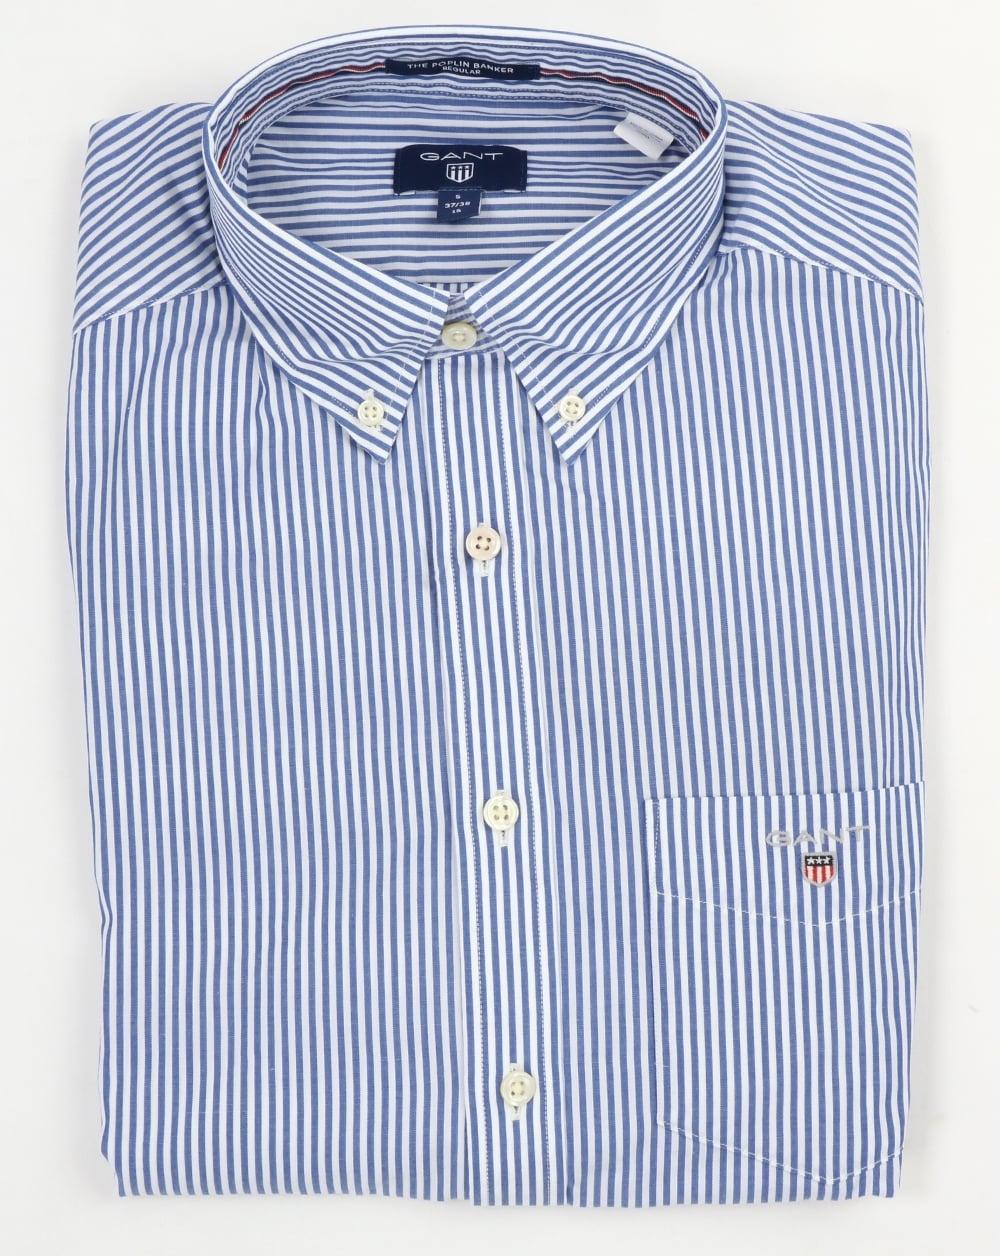 e9933141e0 Gant Poplin Banker Striped Shirt Yale Blue | 80s casual classics